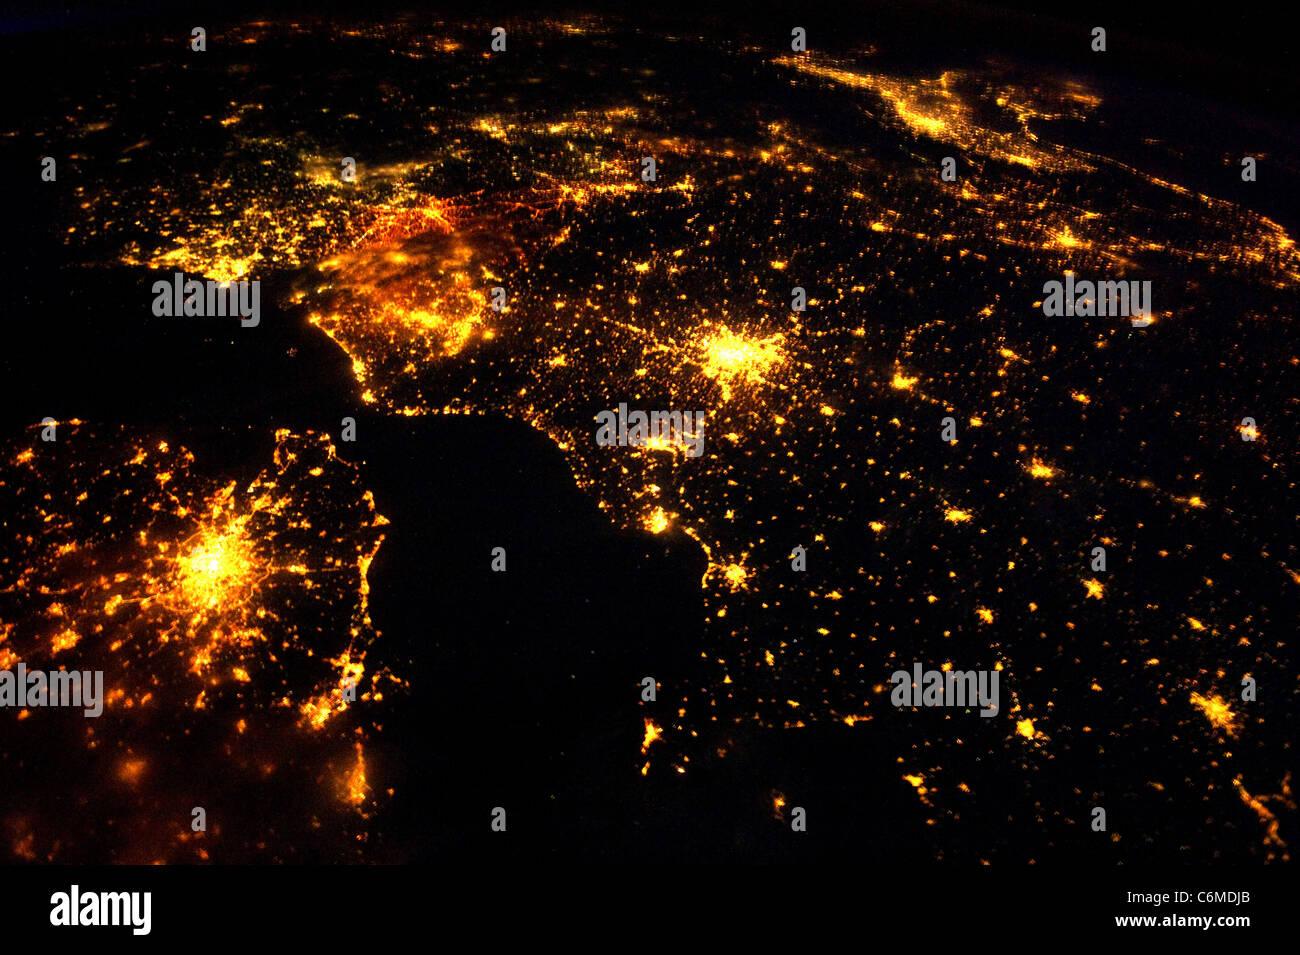 Europe at night, northwestern Europe - Stock Image